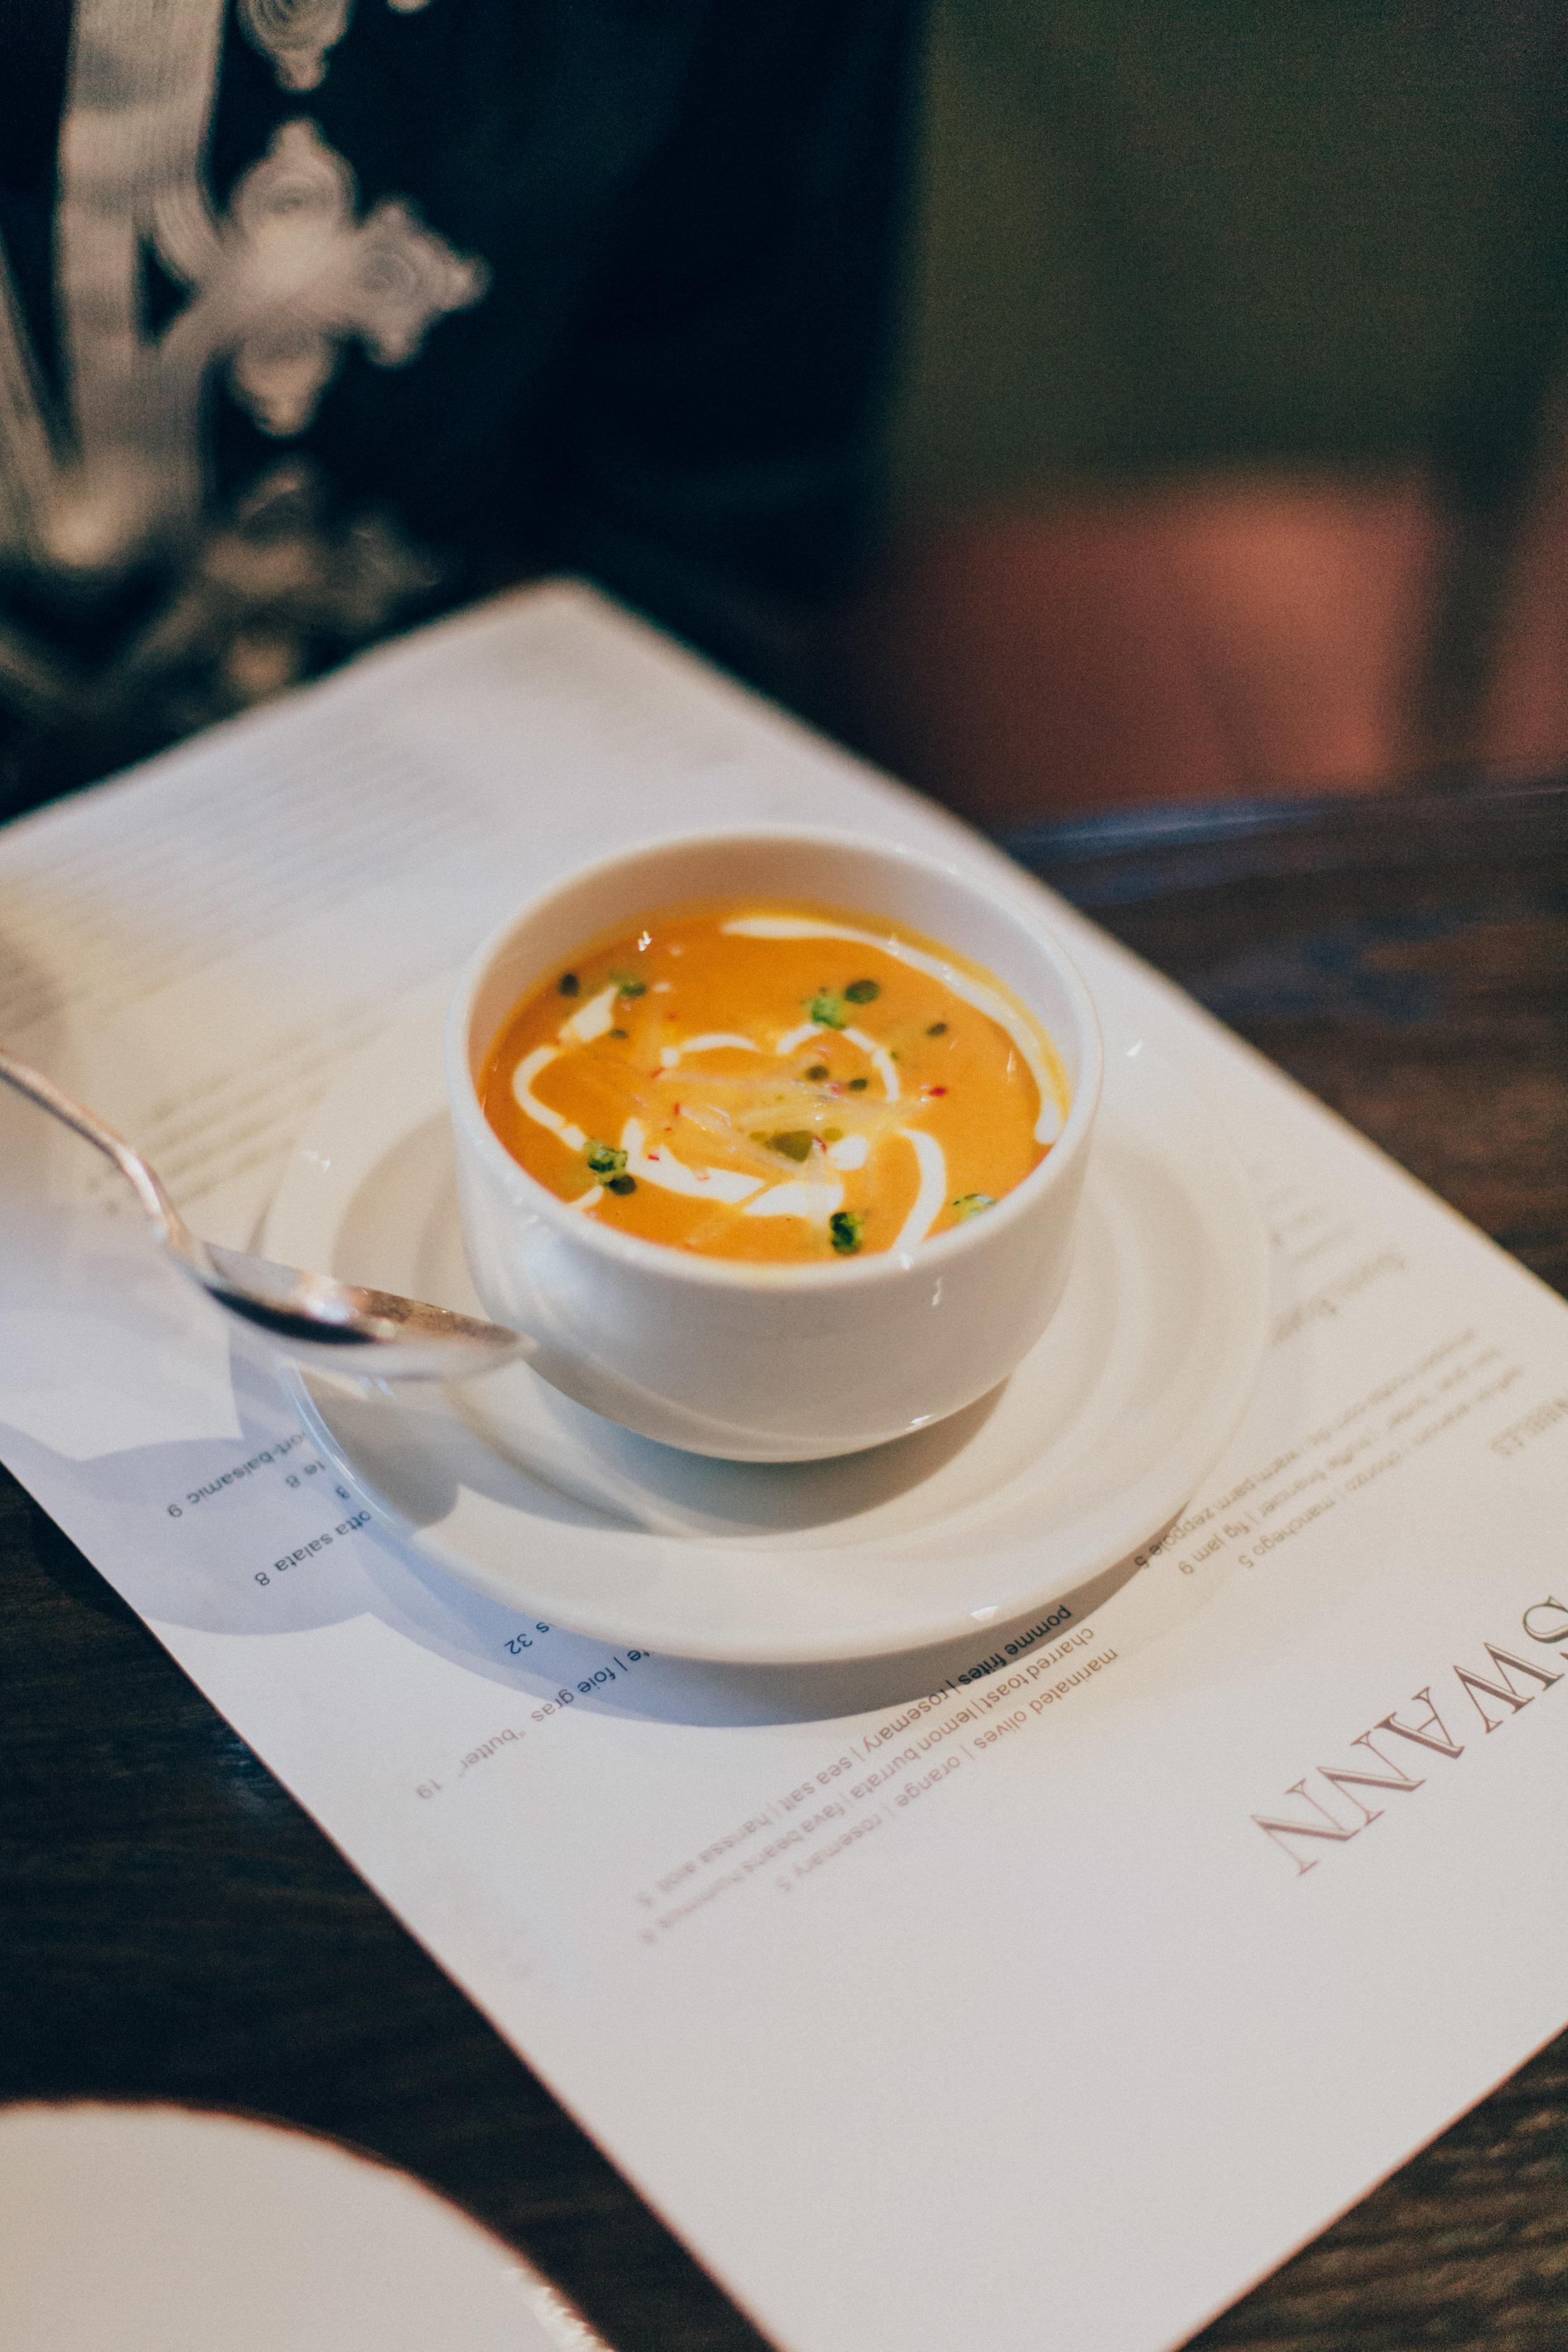 Spiced Carrot Soup - Red lentils, buttermilk creme, radish & mint-pea pesto.